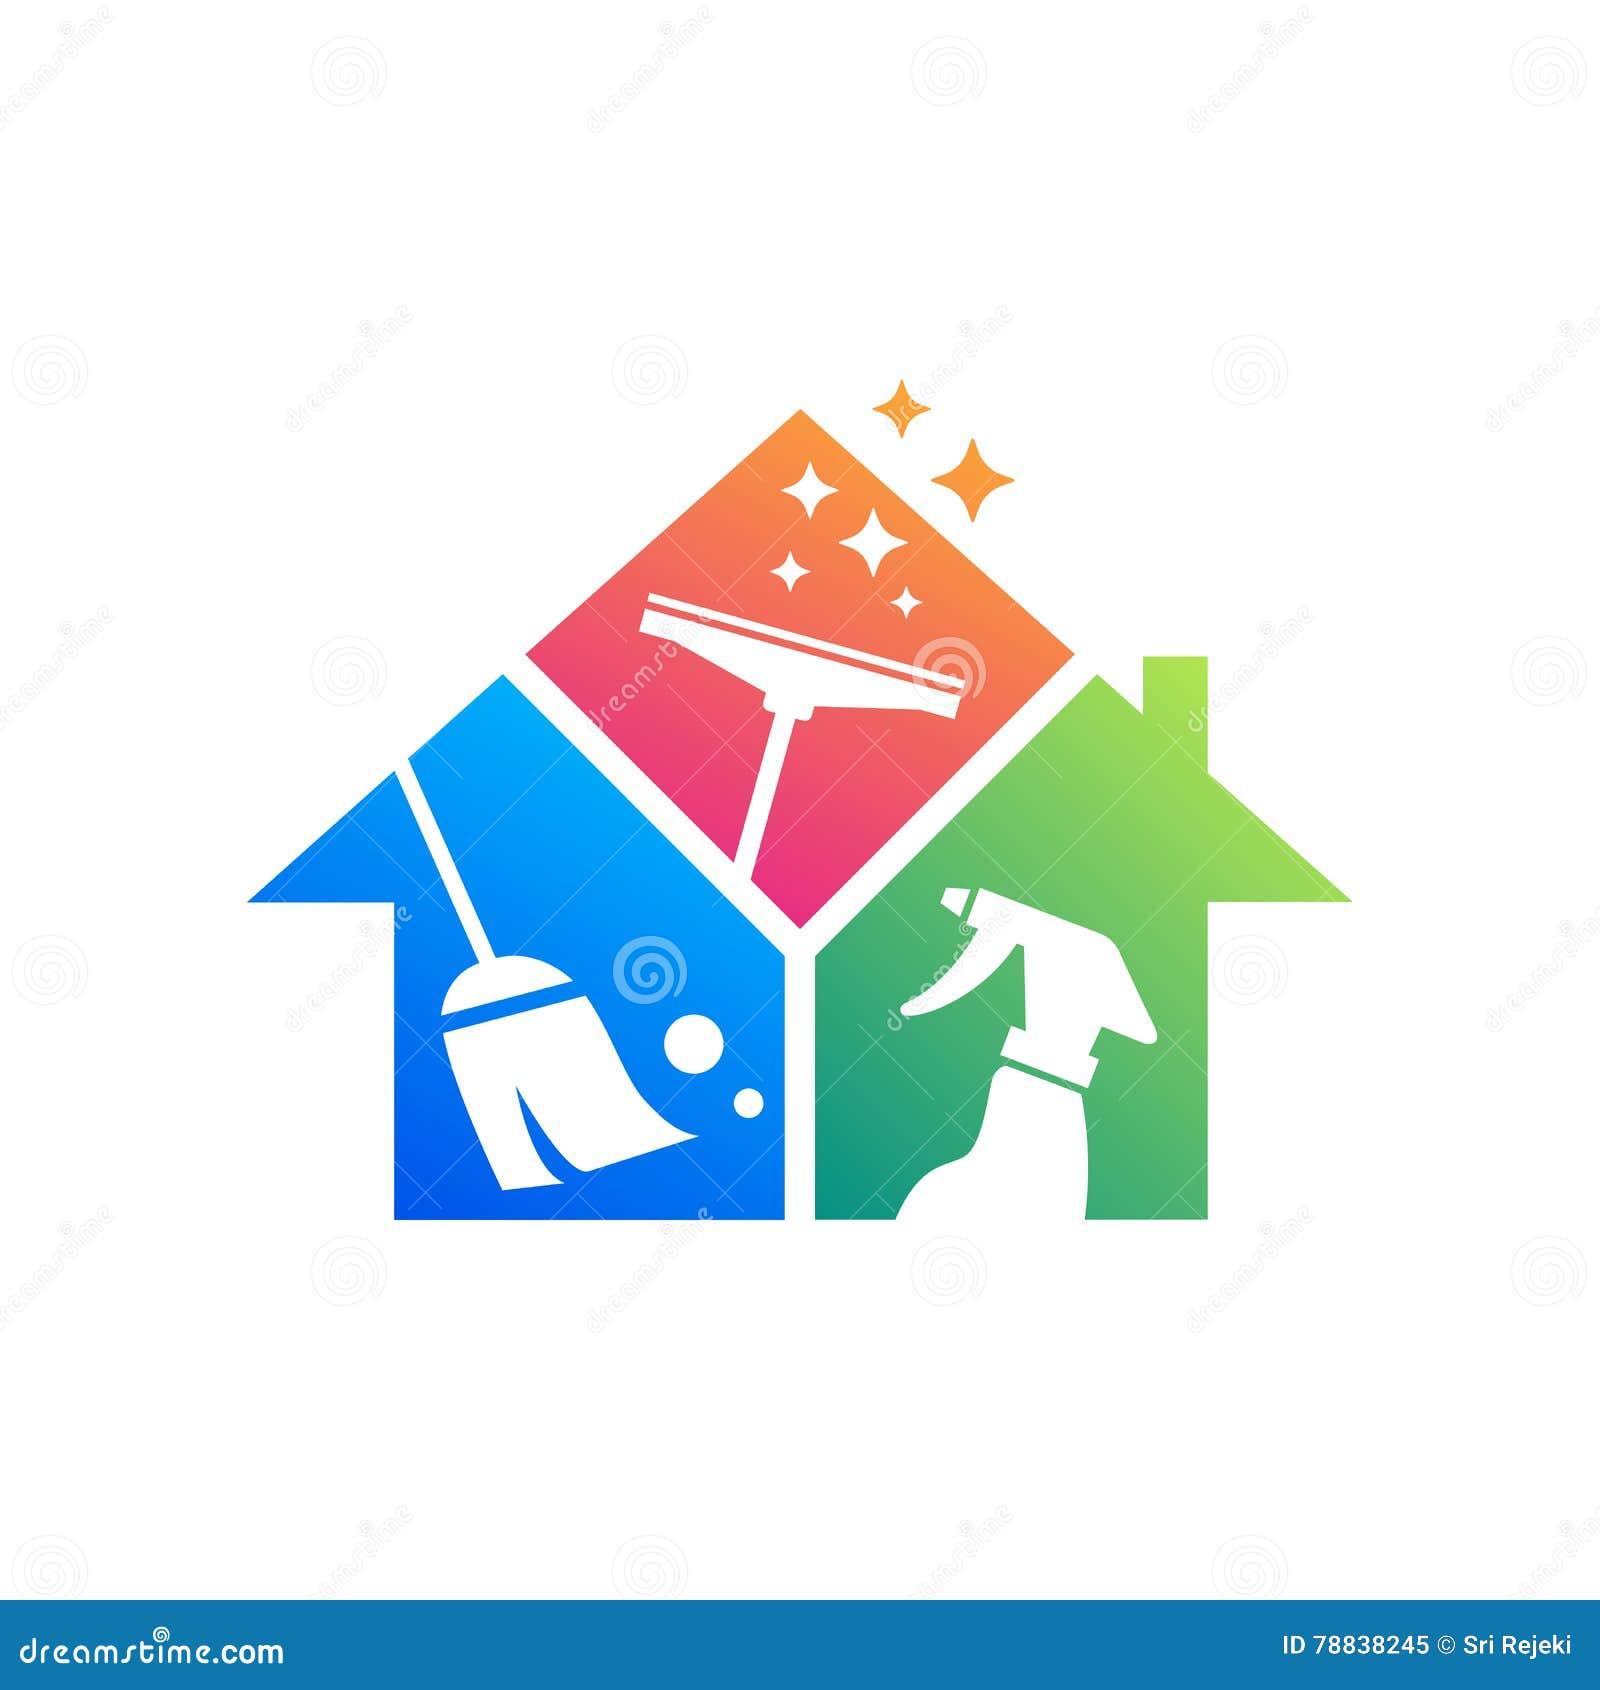 Id e de conception de logo de service de nettoyage calibre for Idee entreprise de service